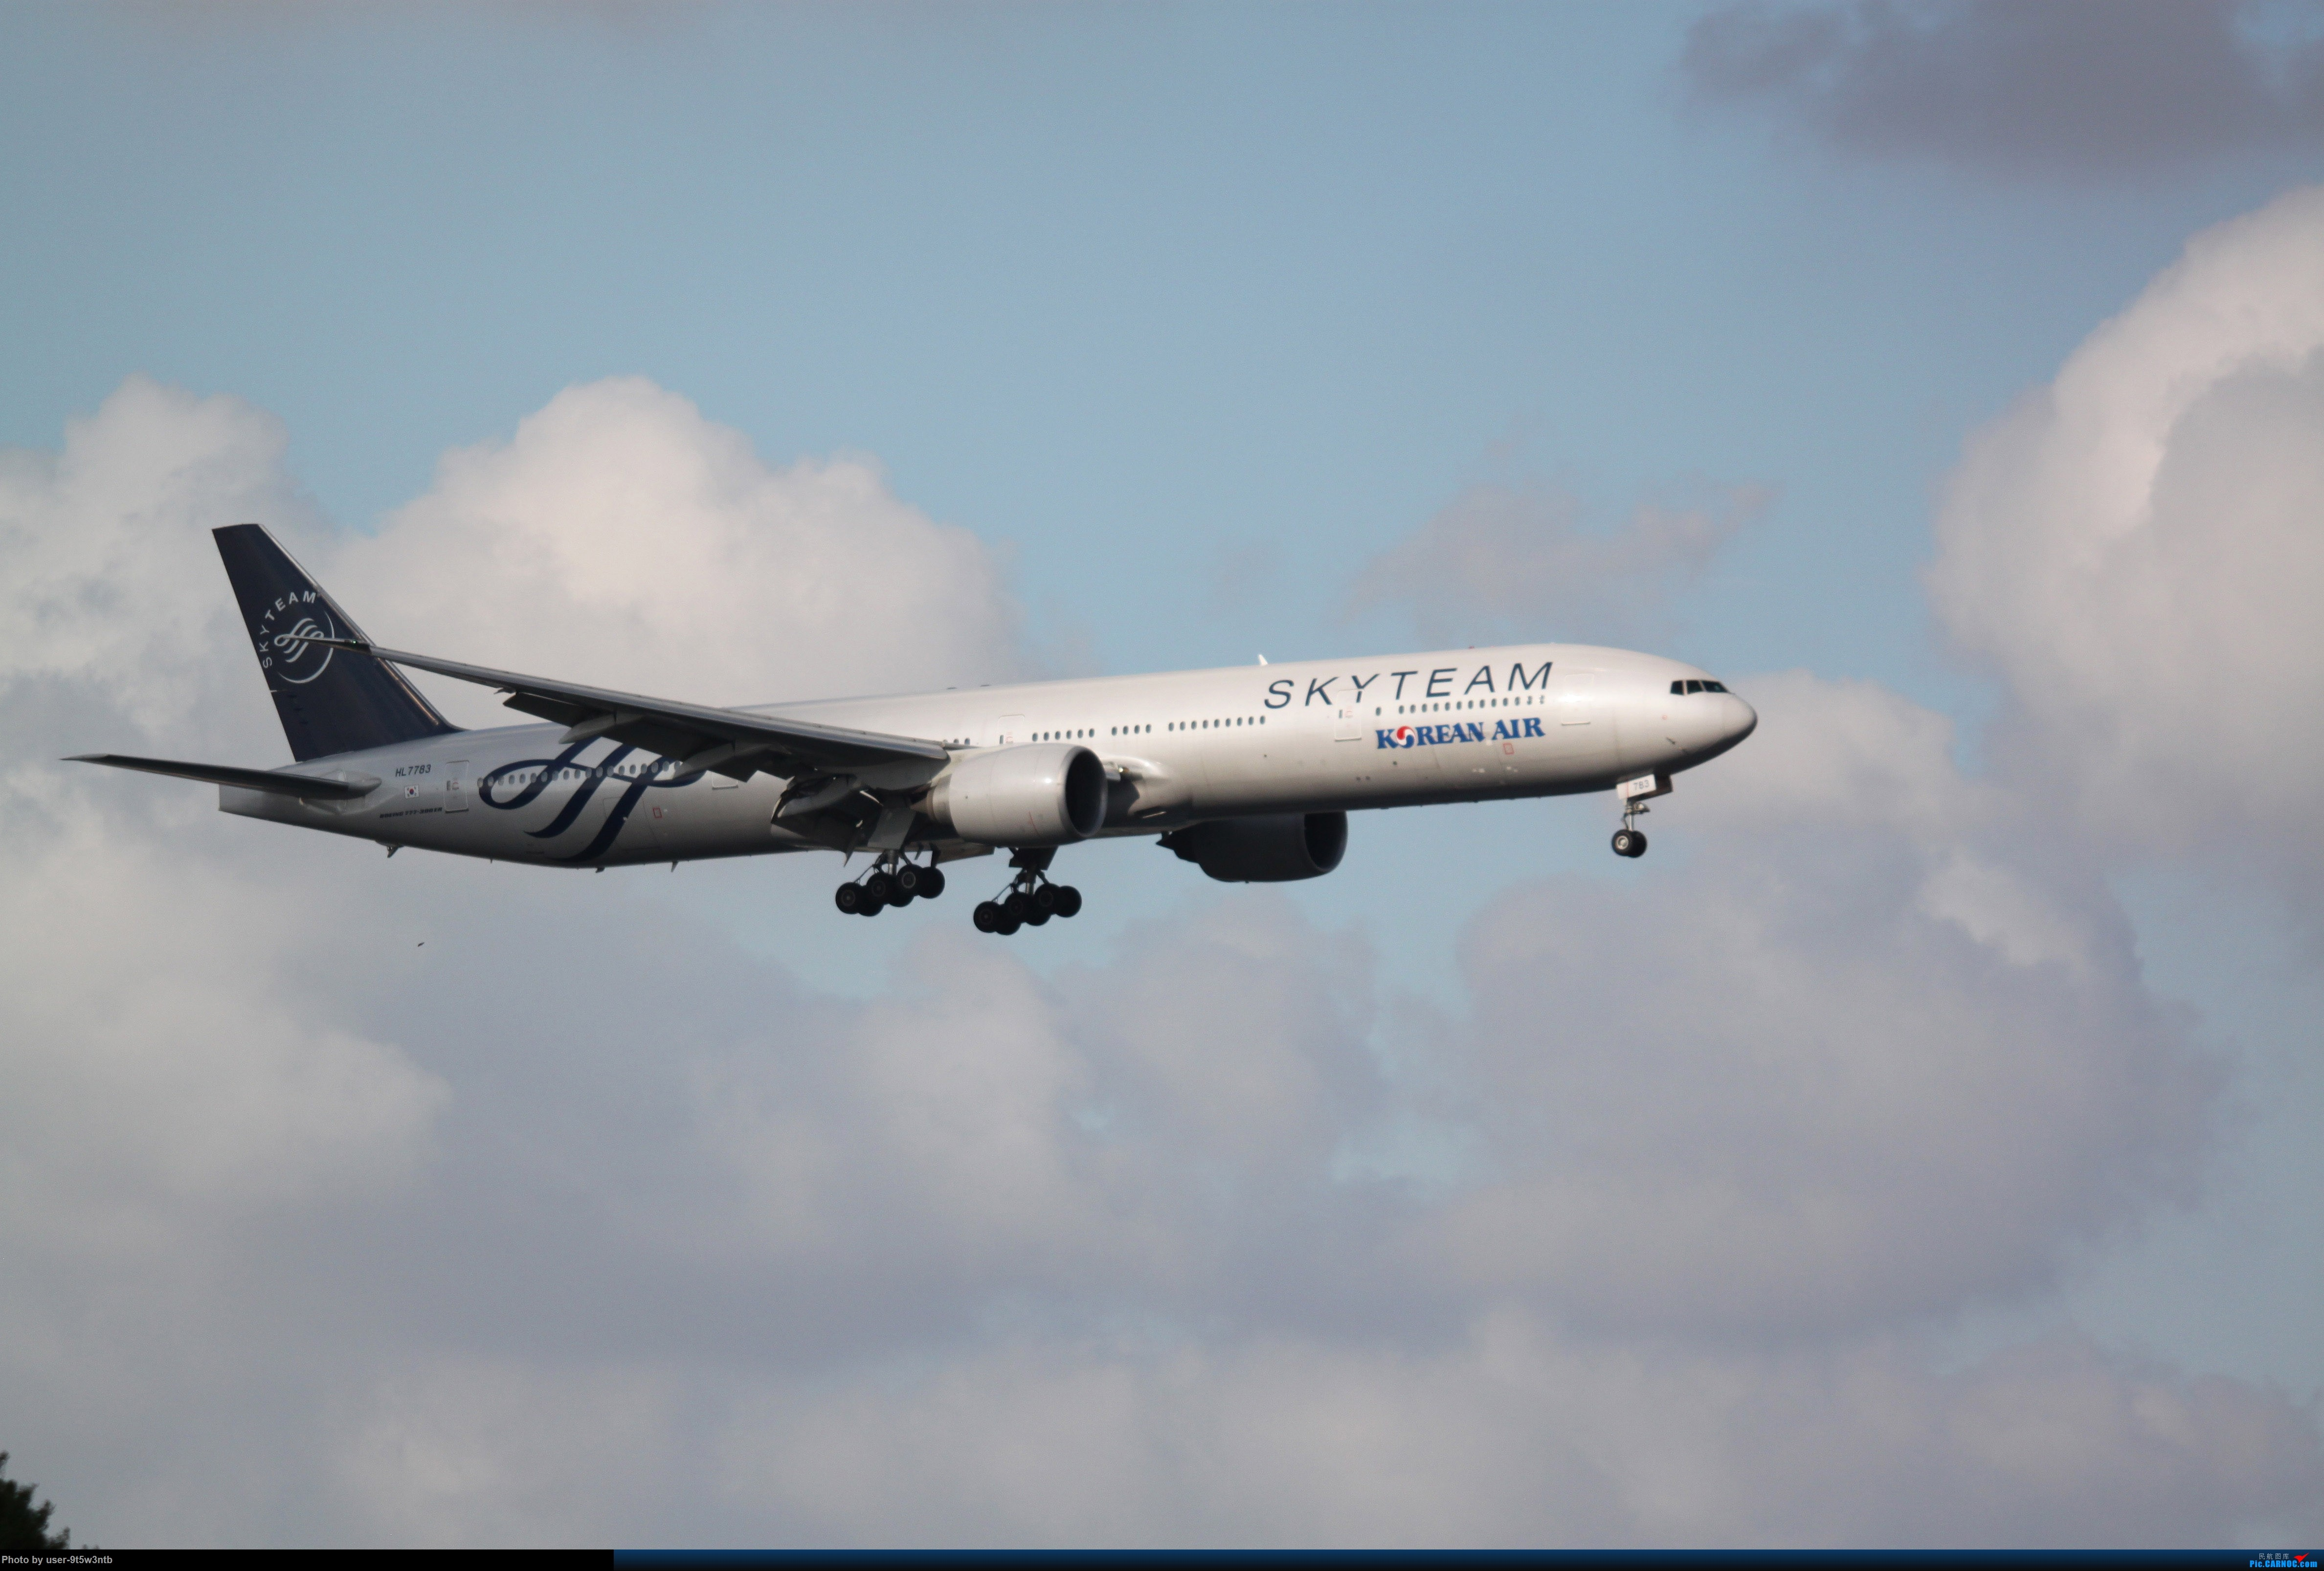 Re:[原创]来整理下最近在虹桥拍到的彩绘机吧~ BOEING 777-300ER HL7783 中国上海虹桥国际机场